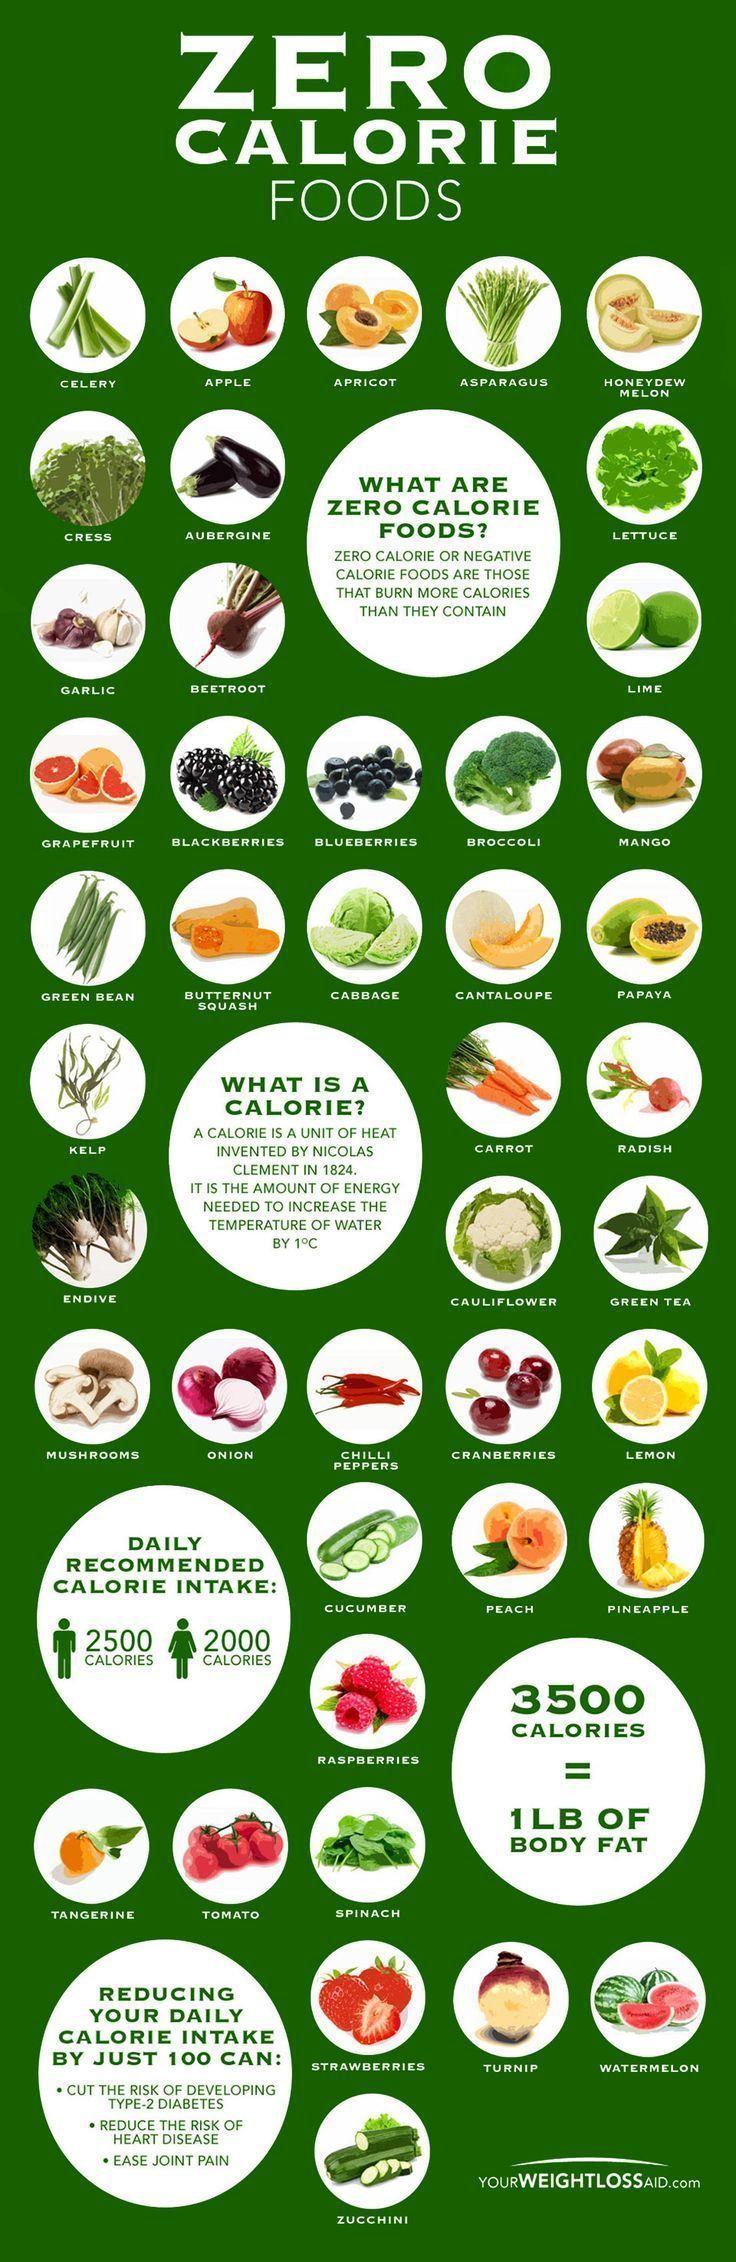 30 day diet lose weight fast